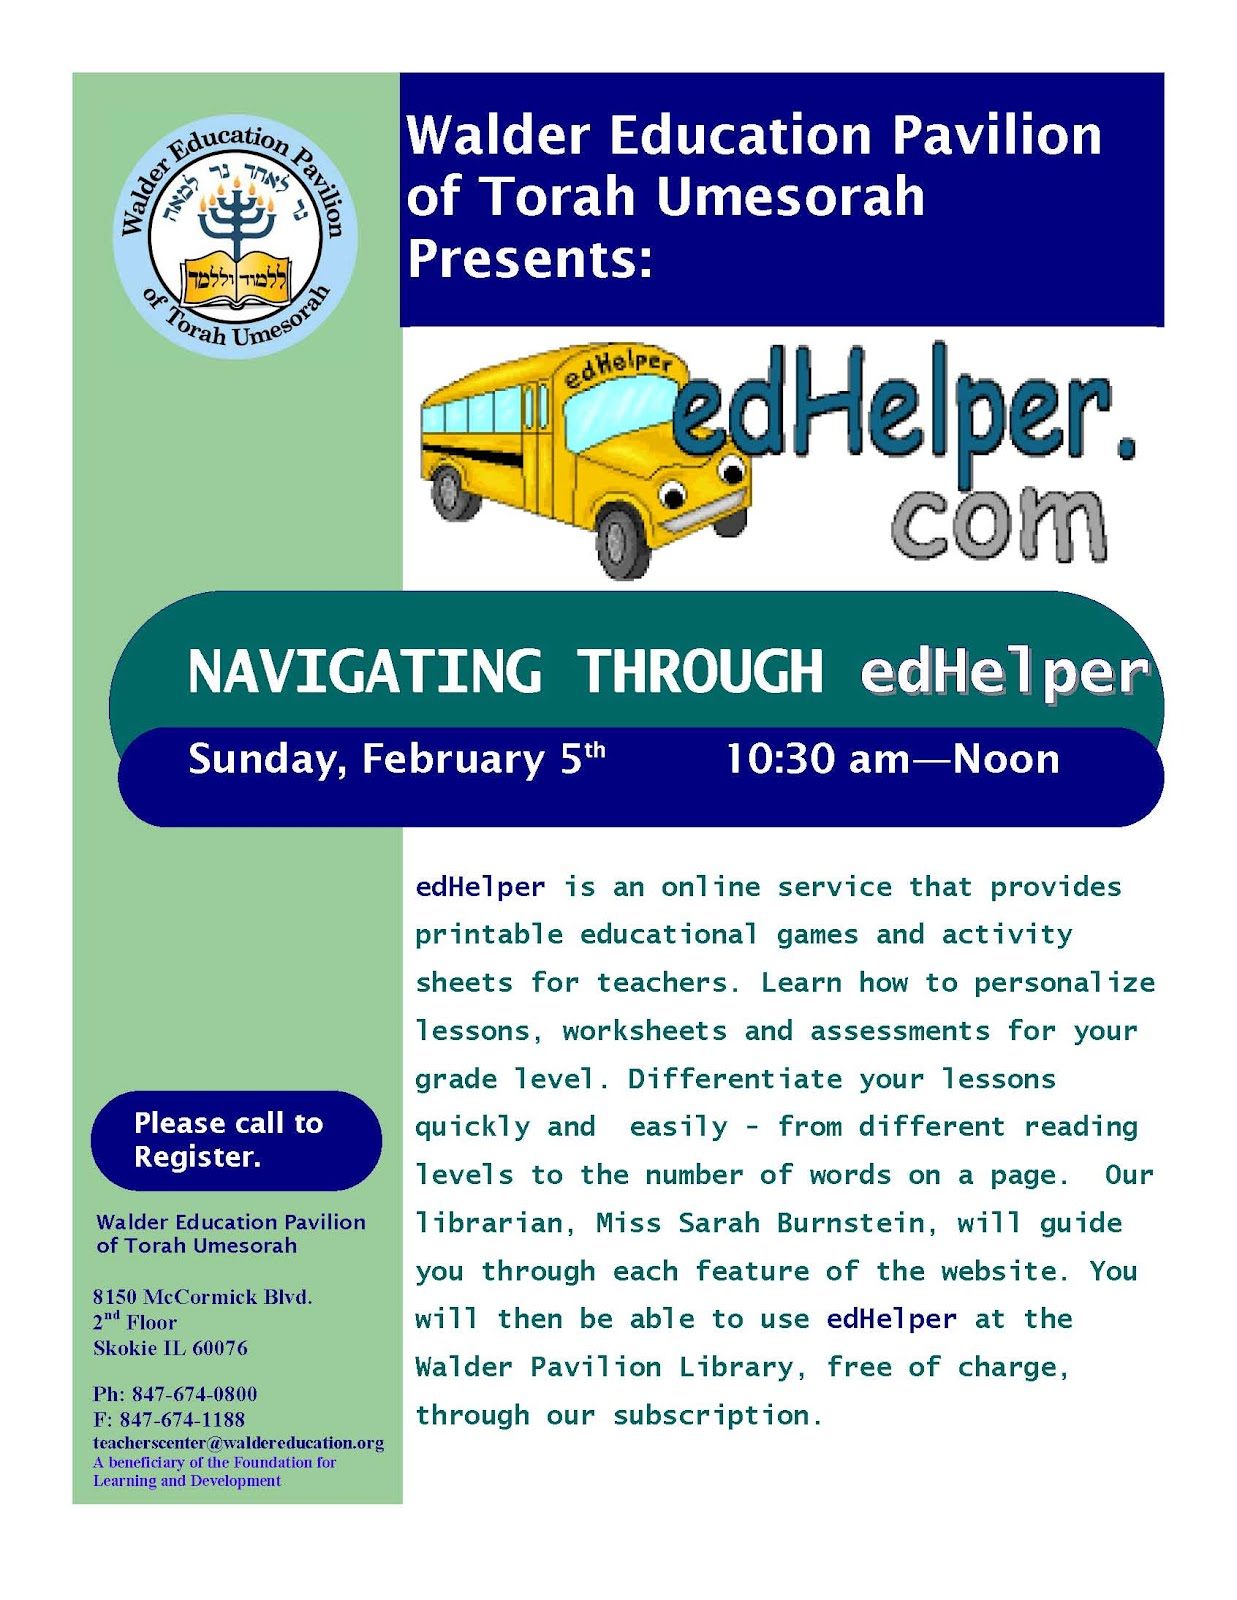 Walder Education Pavilion Of Torah Umesorah February